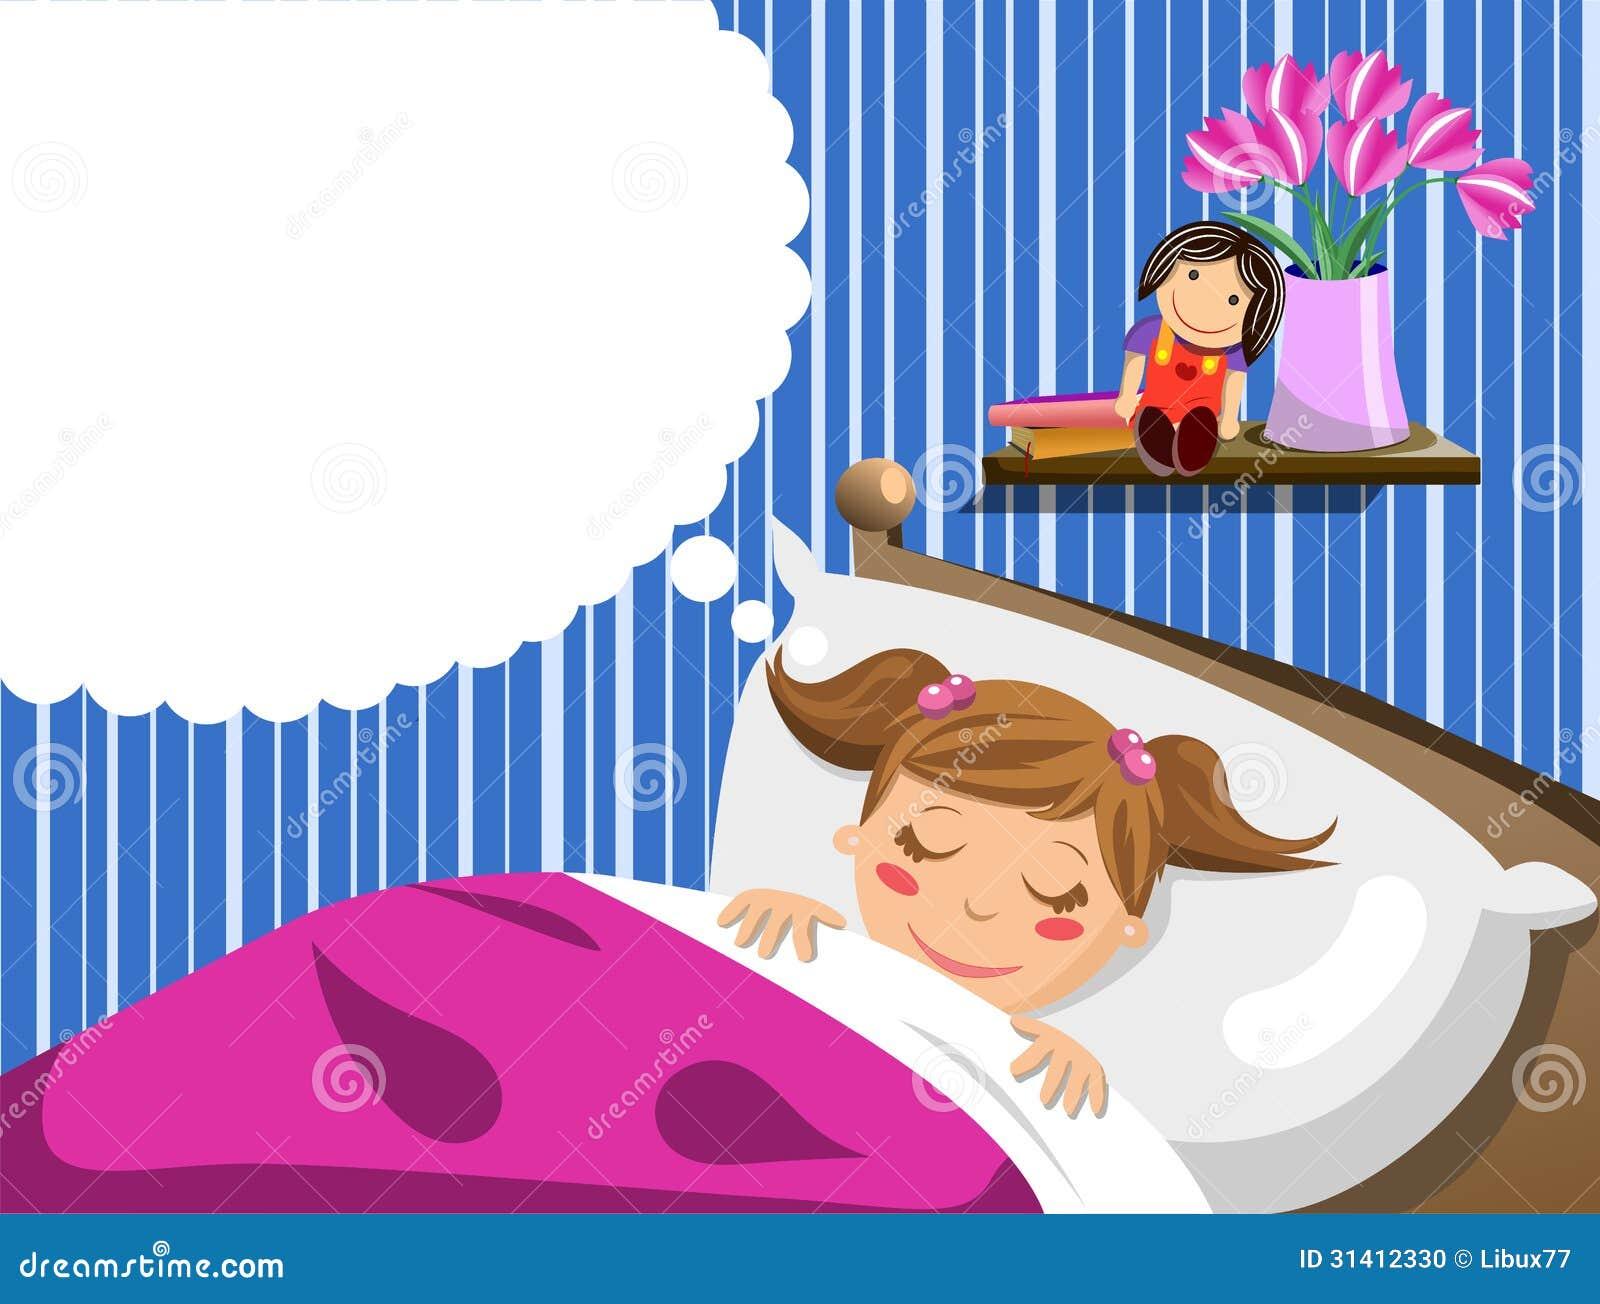 Little Girl Sleeping And Having Dreams Stock Vector